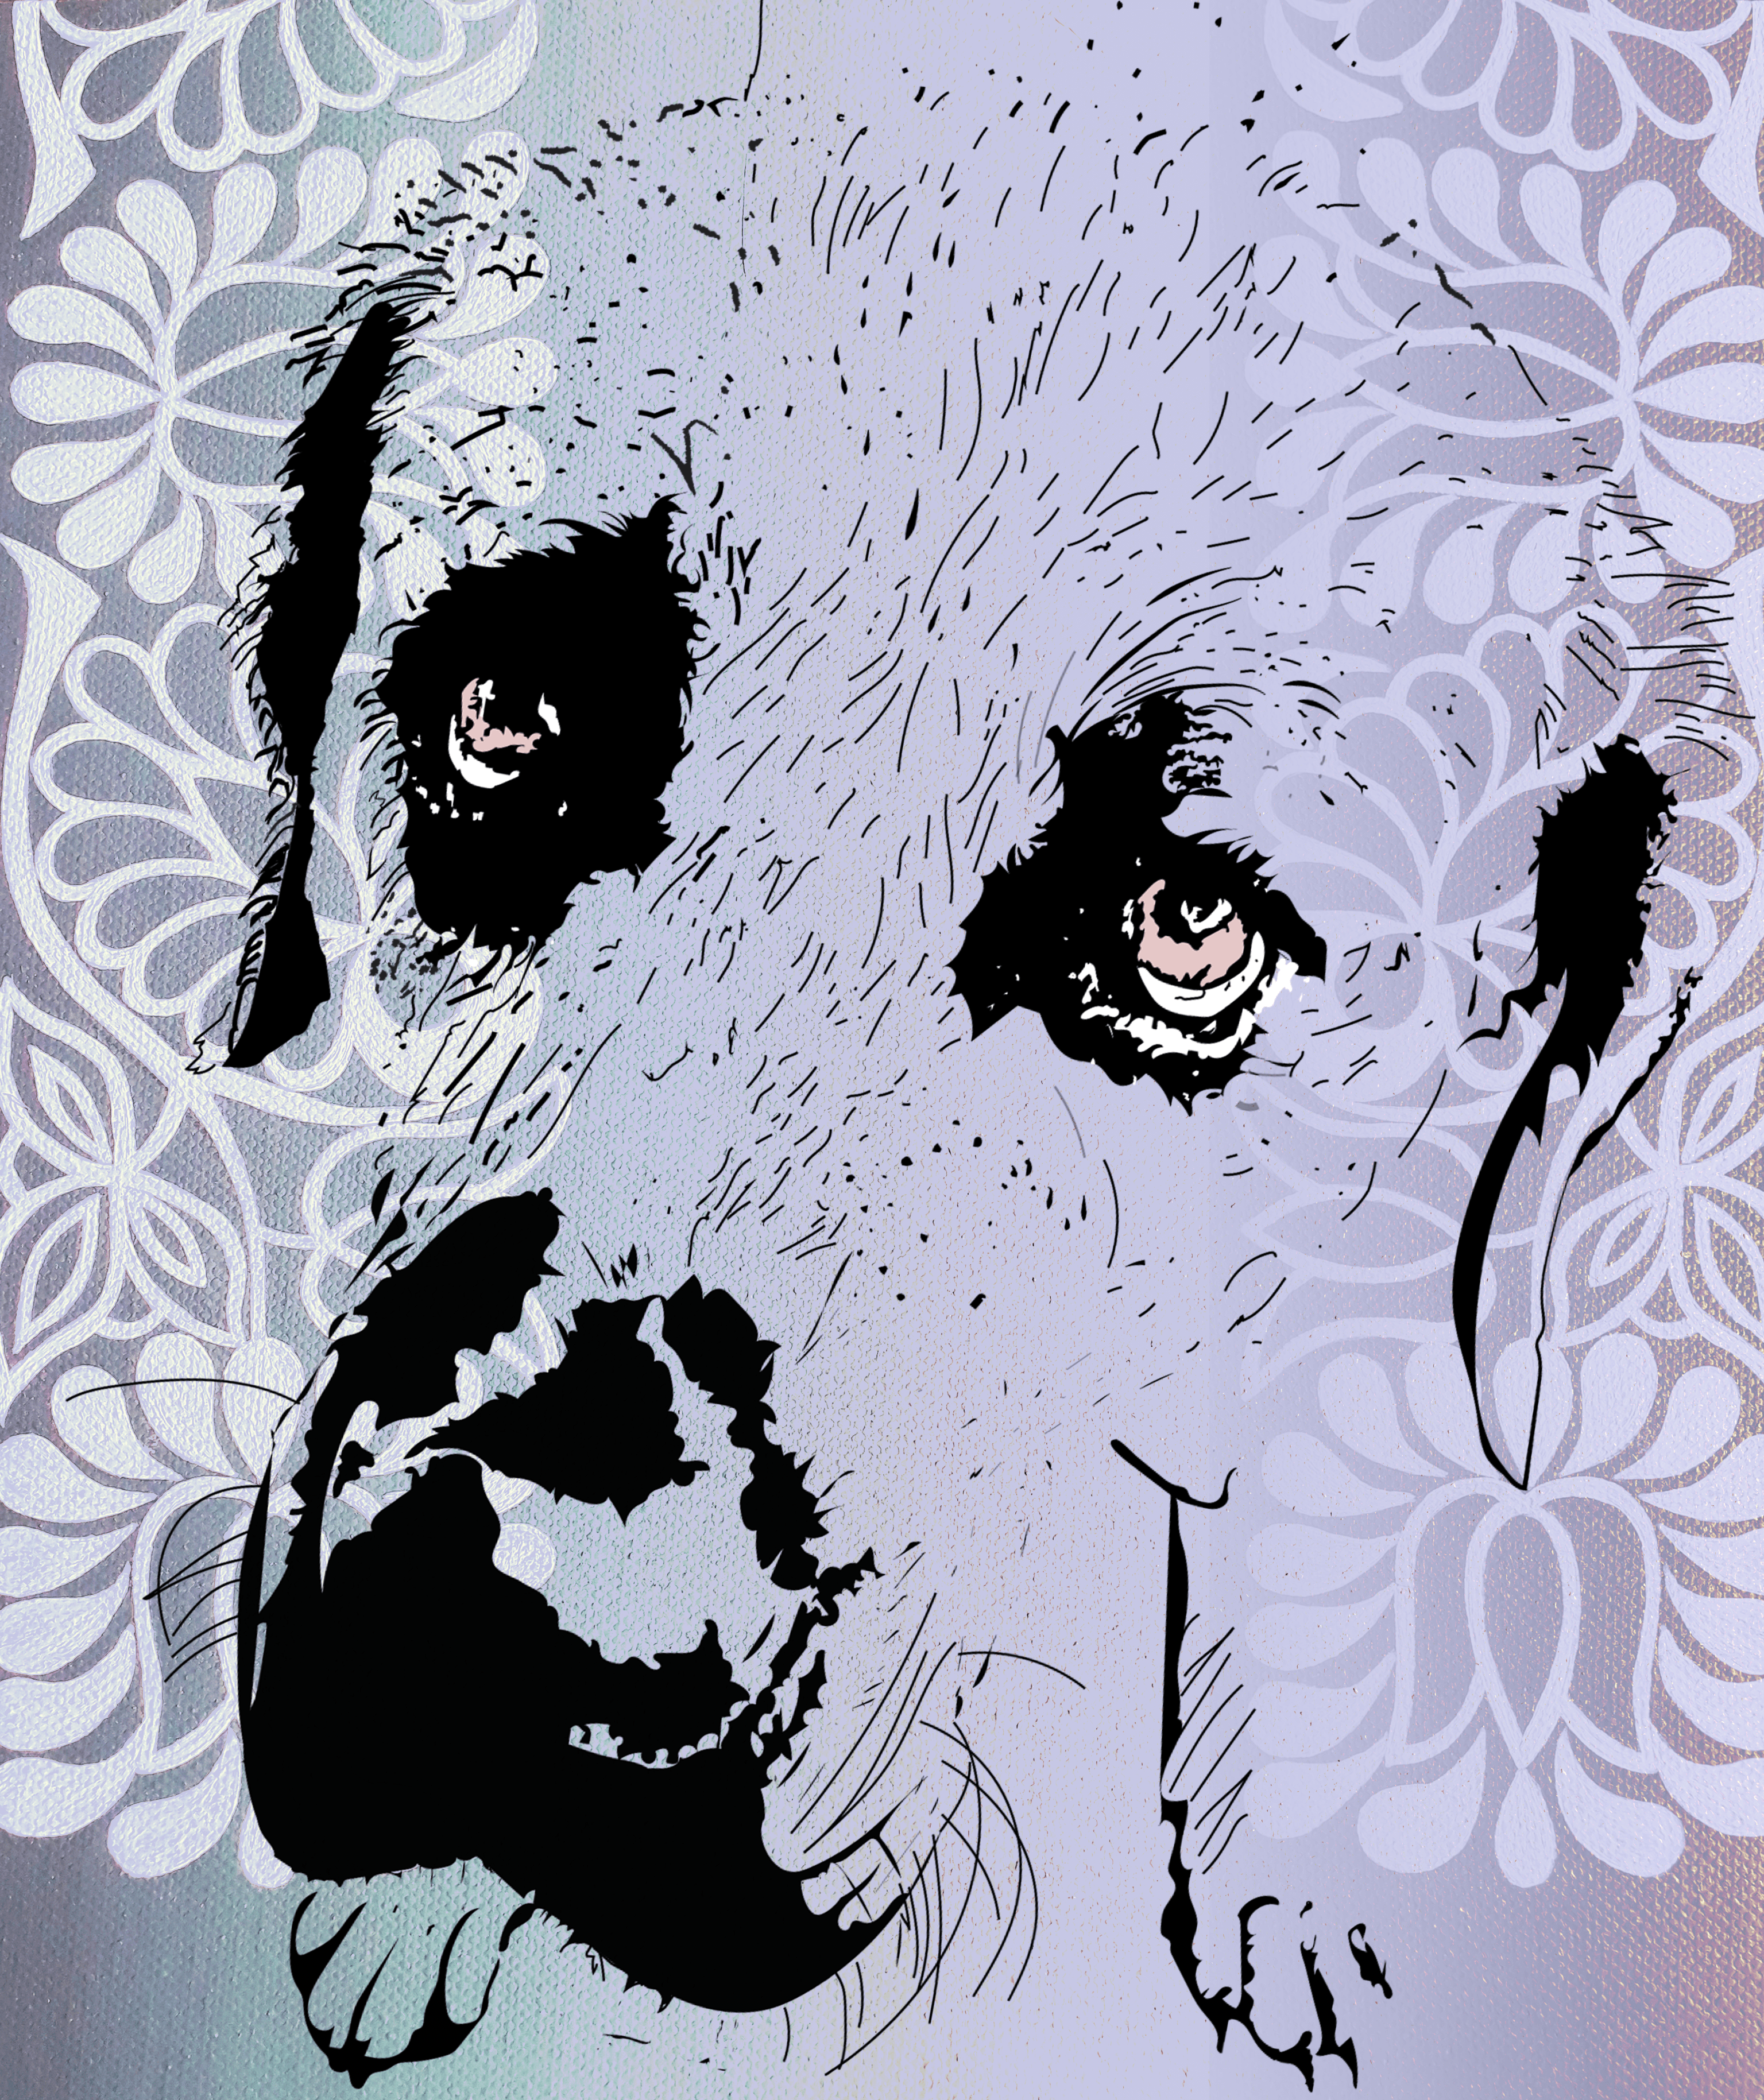 Hašiko – Portraits of the dog